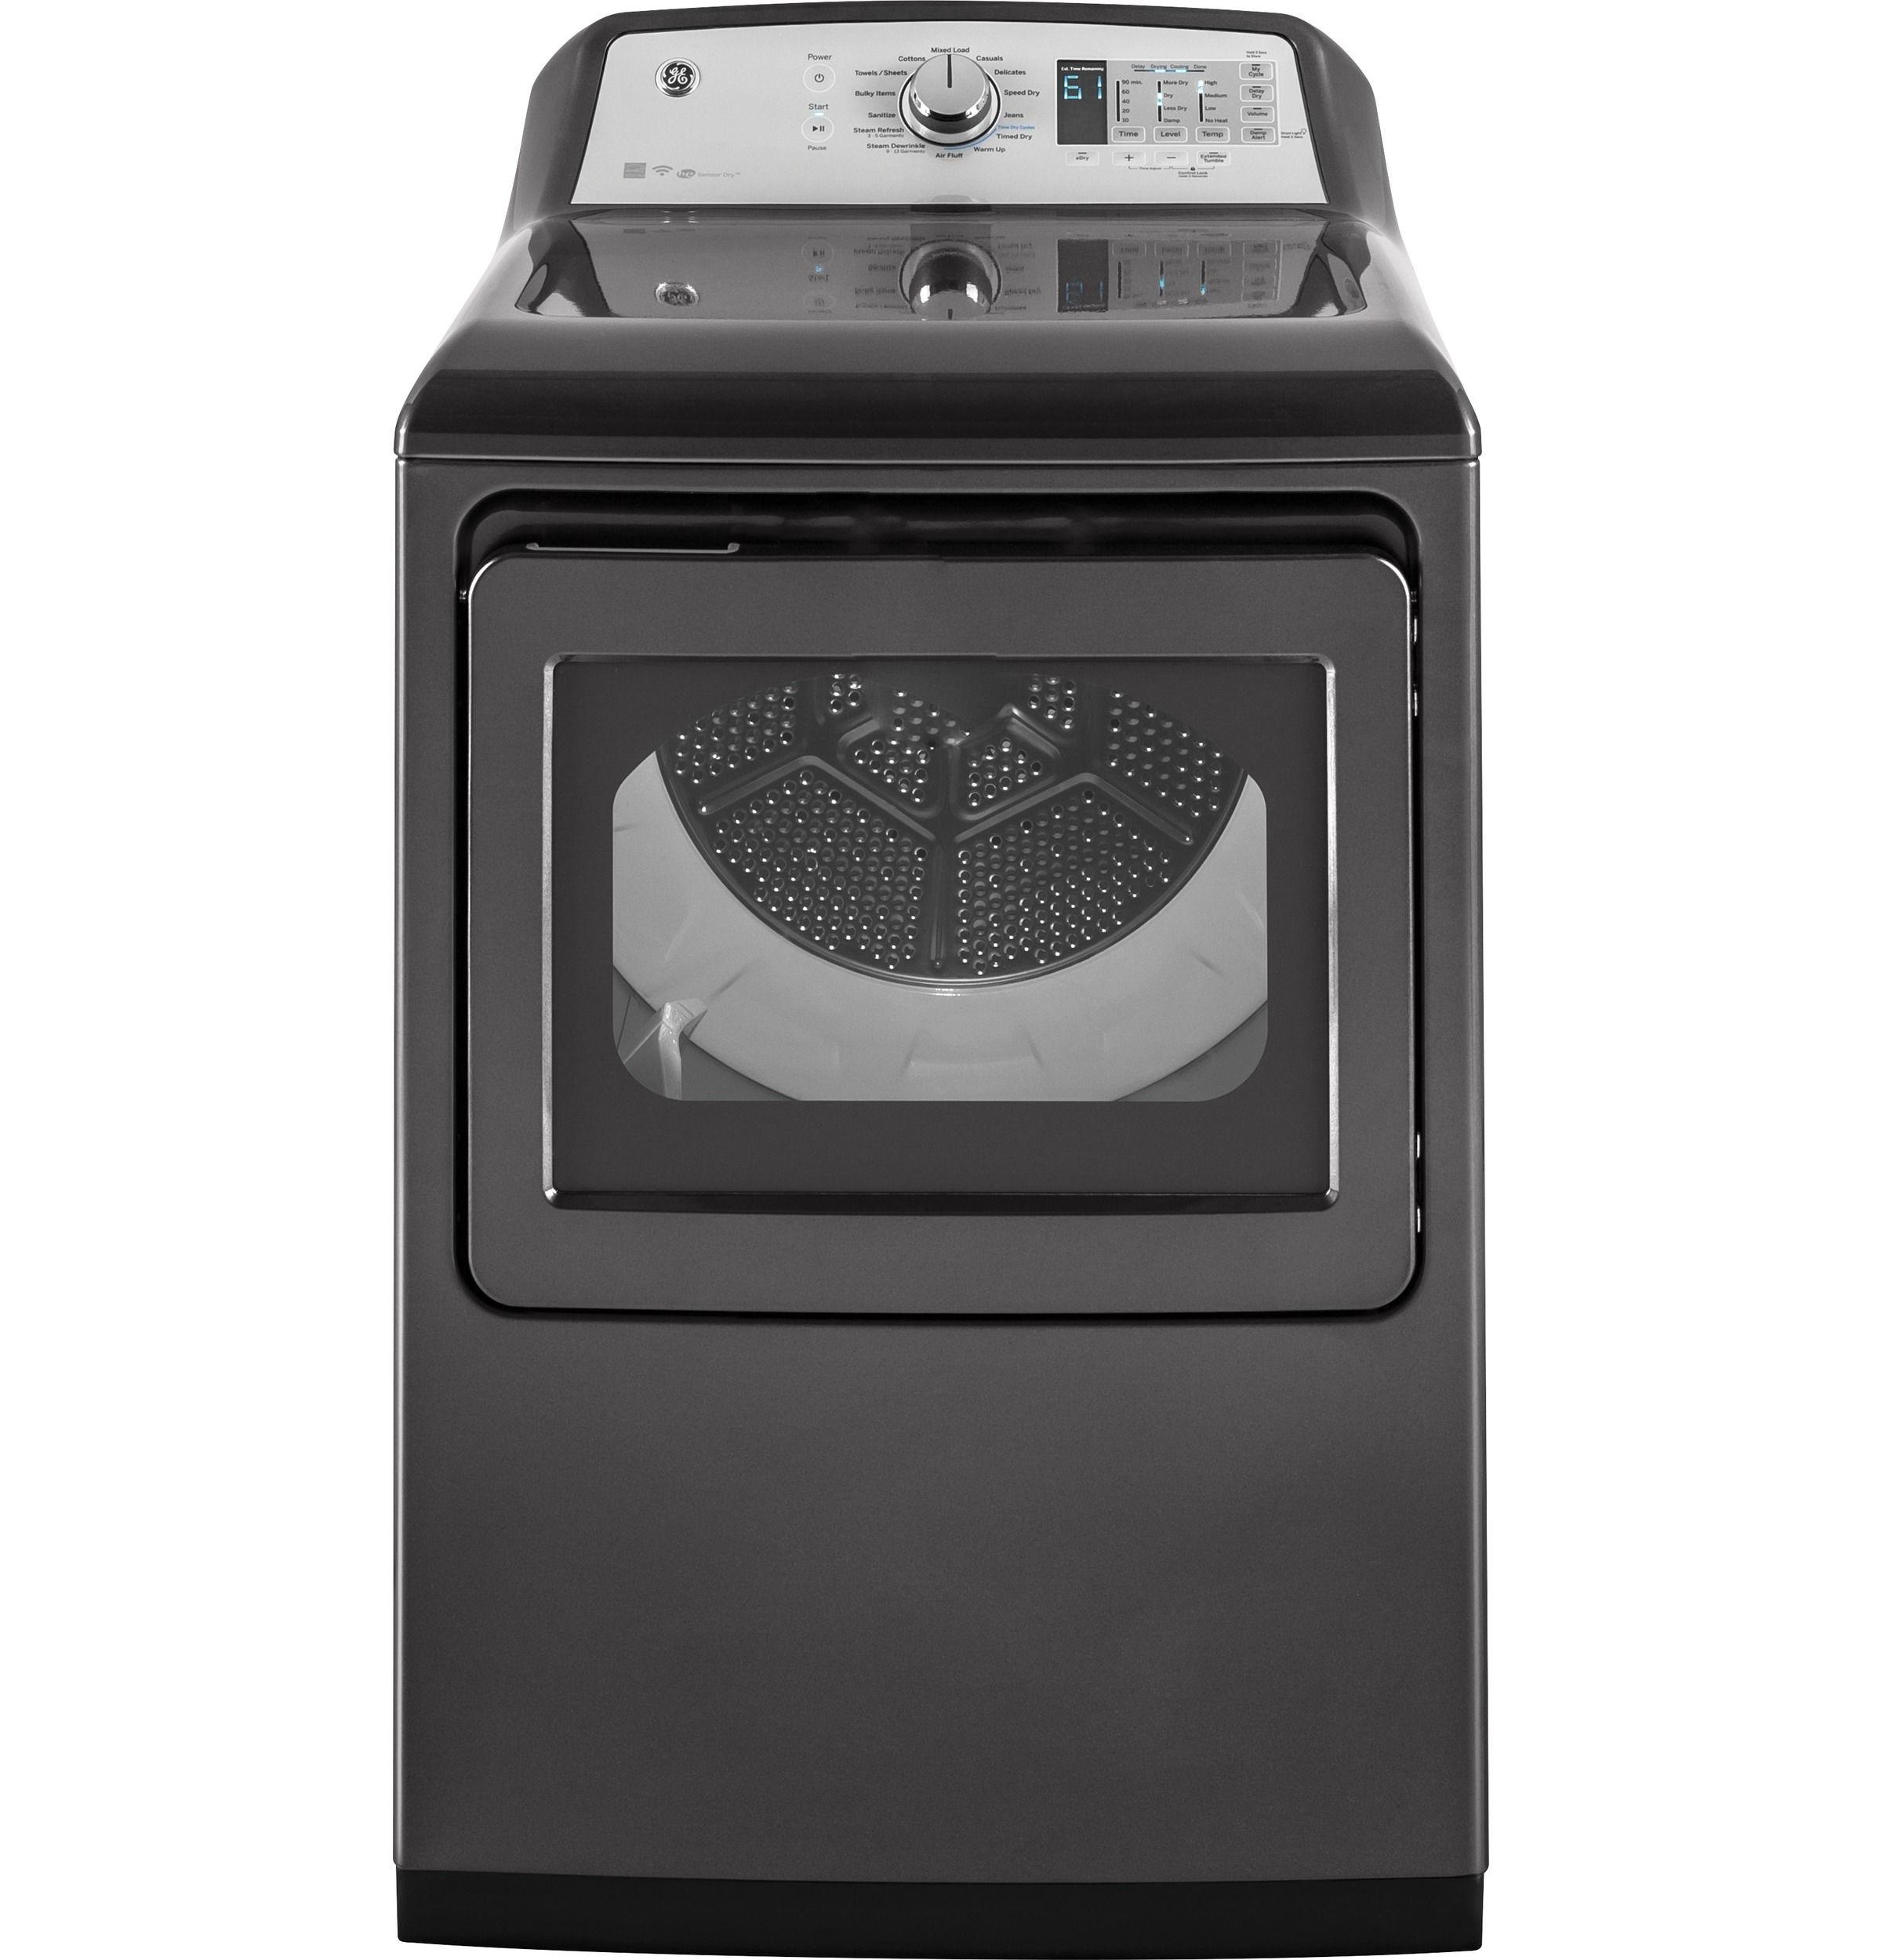 Ge Gtd75ecpldg 7 4 Cu Ft Electric Dryer With He Sensor Dry Diamond Gray Electric Dryers Gas Dryer Energy Star